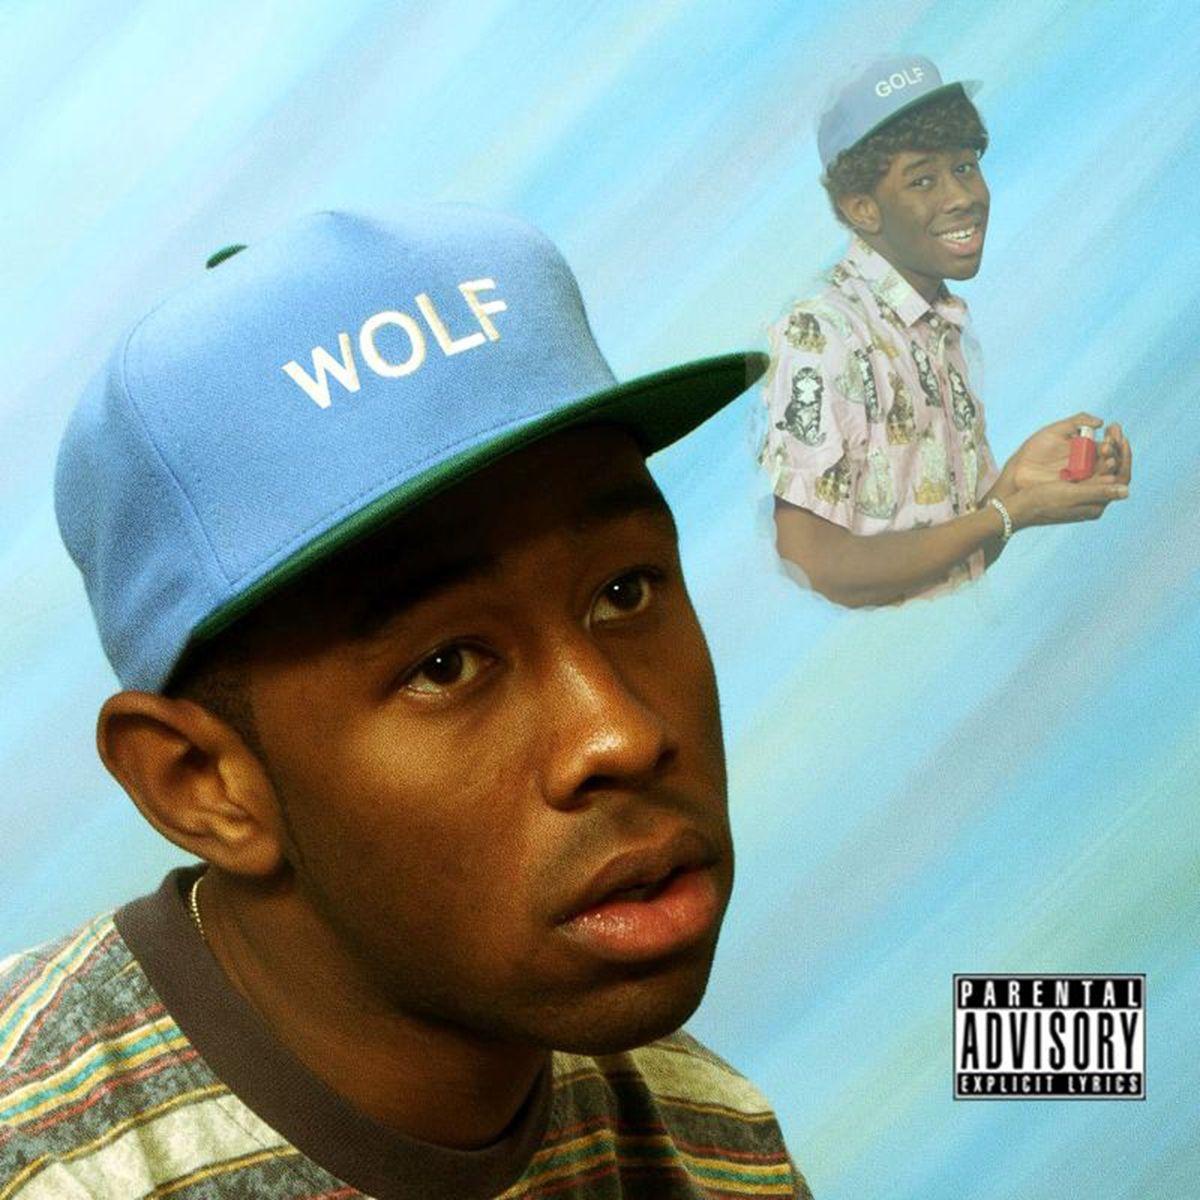 Tyler, the Creator's 'Wolf' Has 3 Killer Album Covers